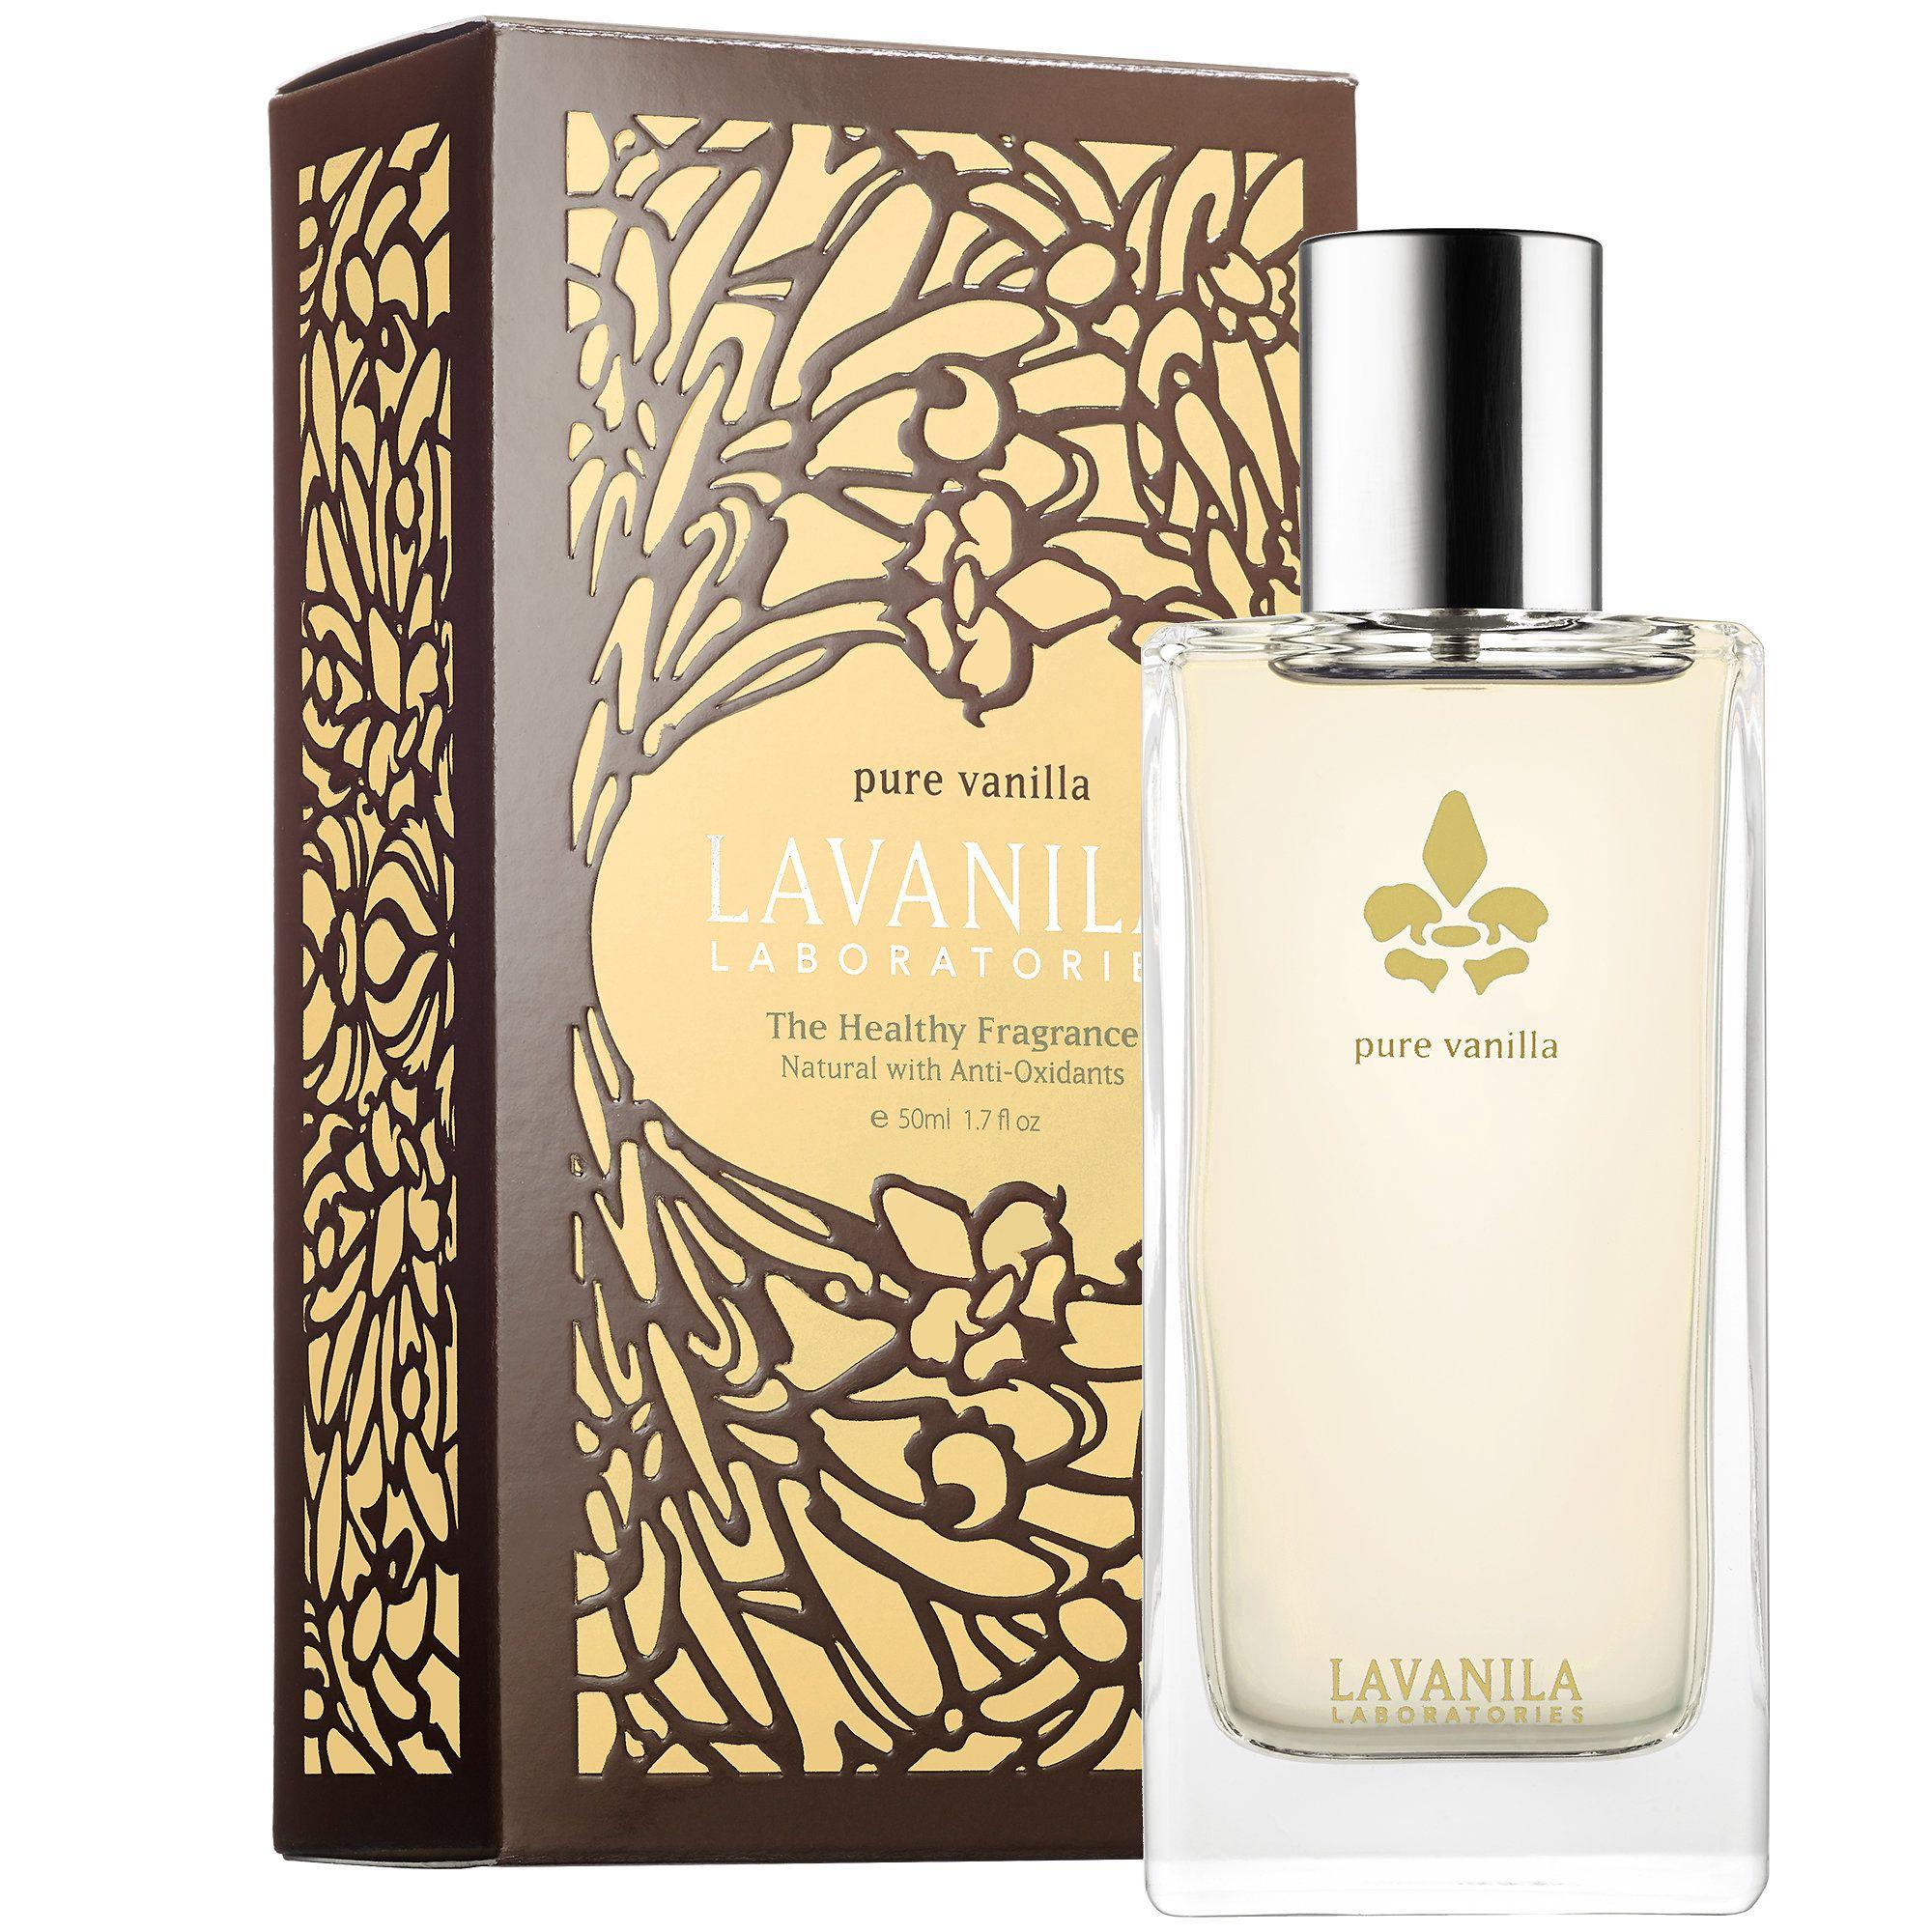 Pure Vanilla Fragrance LAVANILA Sephora Lavender